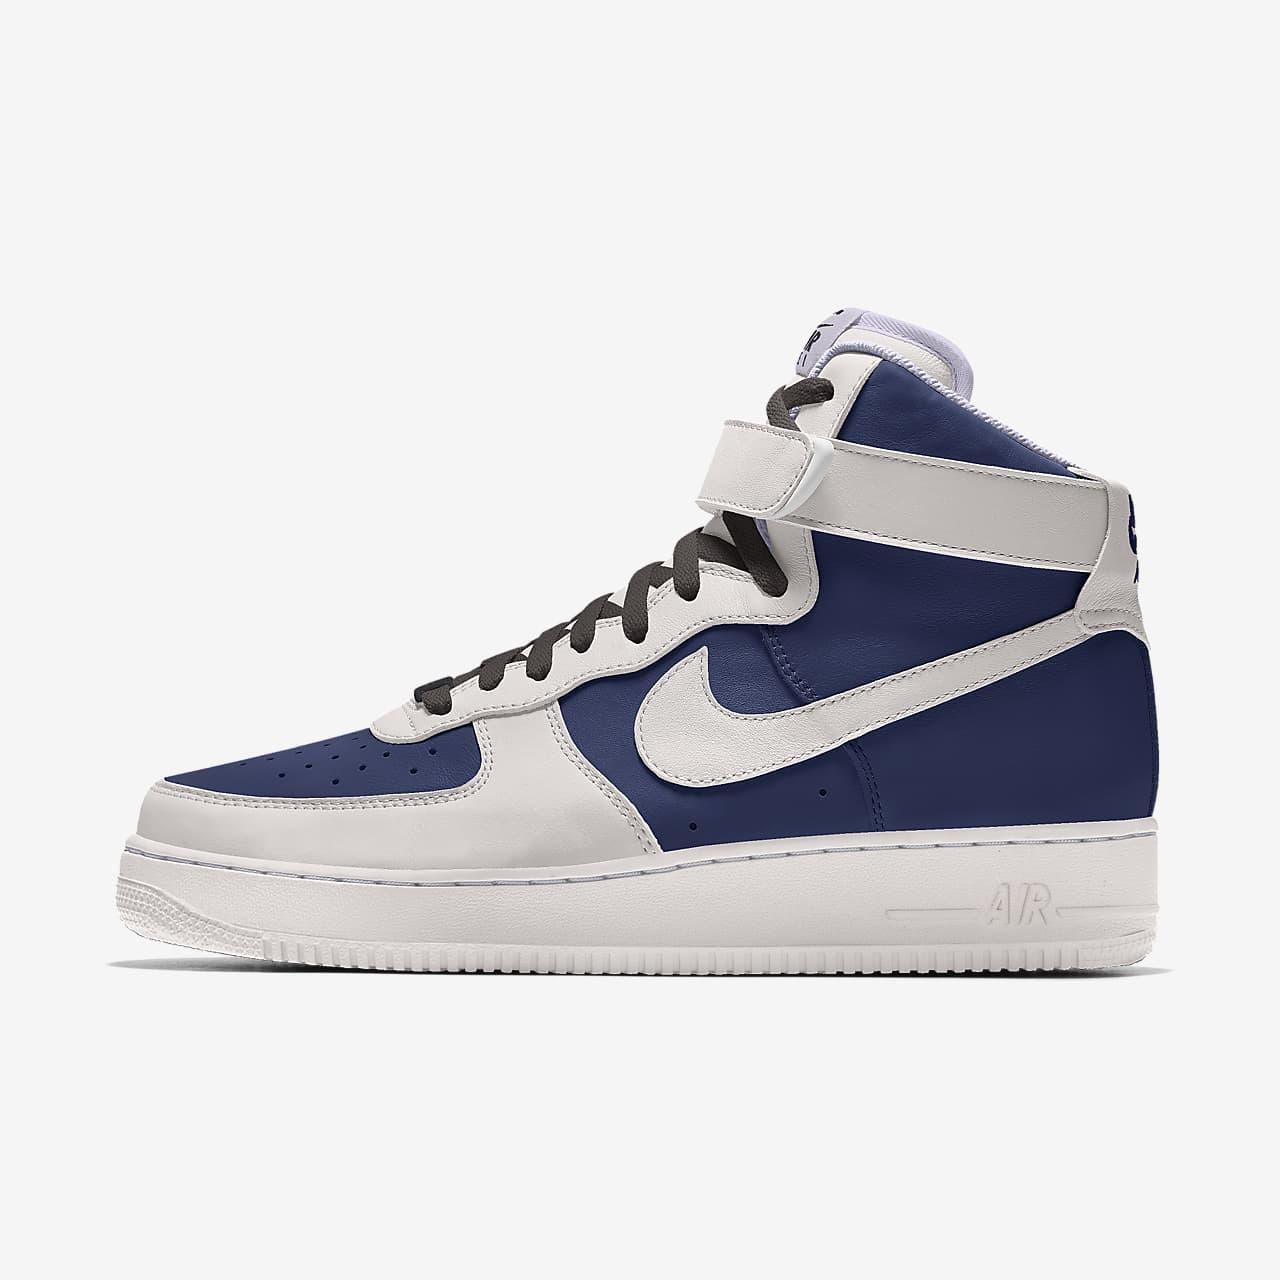 Damskie personalizowane buty Nike Air Force 1 High By You